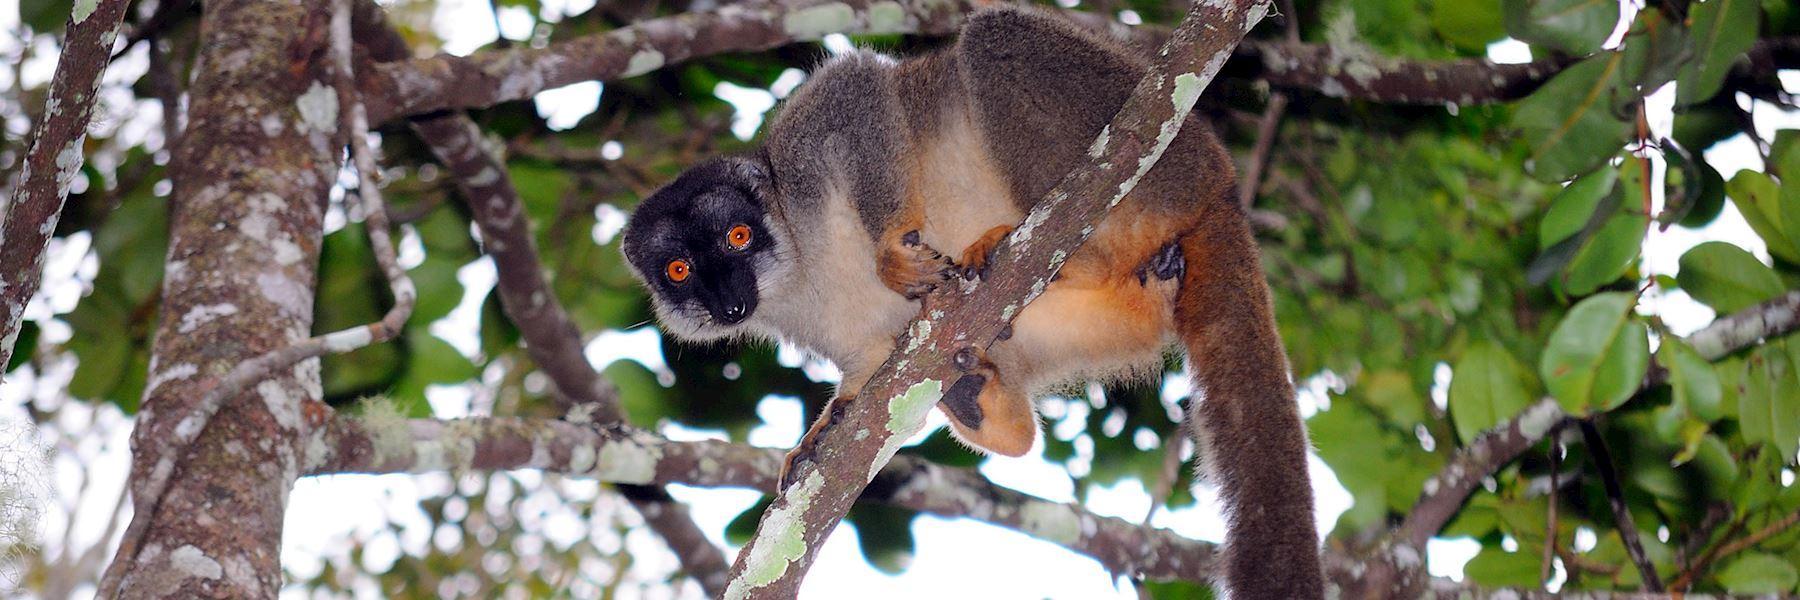 Visit Andasibe National Park (Perinet), Madagascar